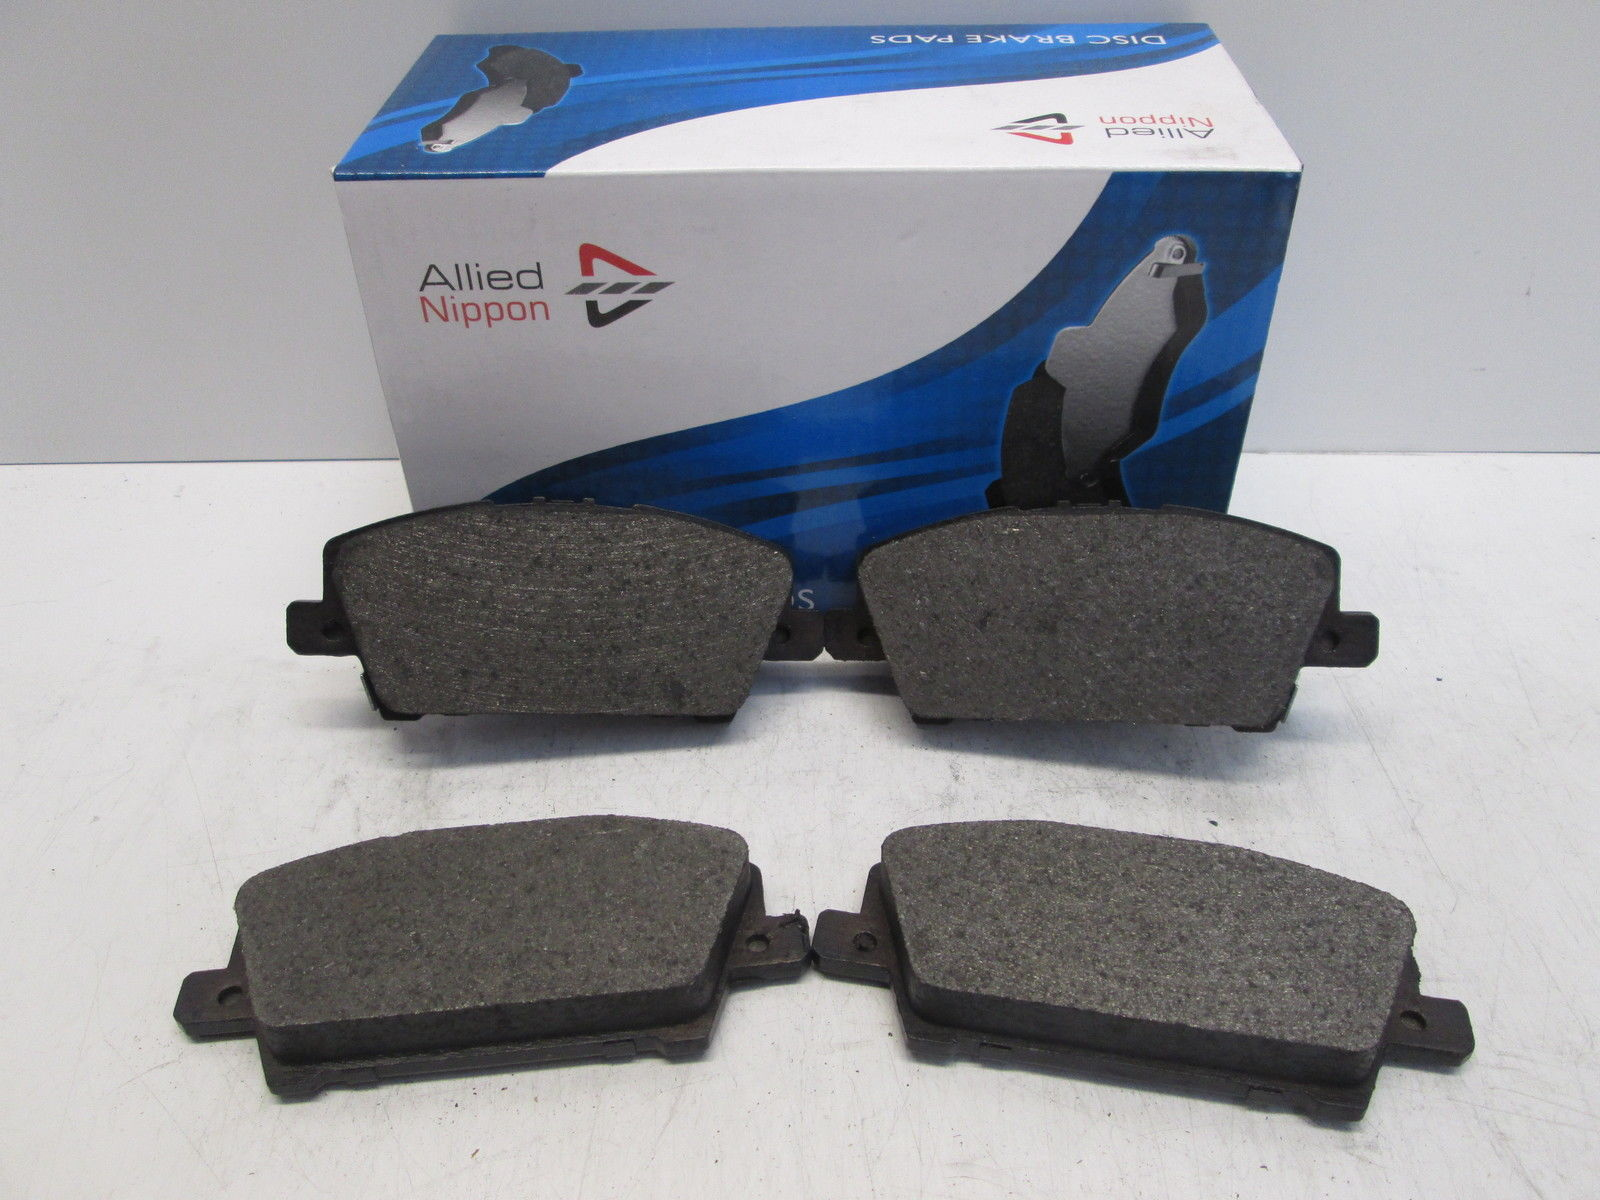 Genuine Allied Nippon Honda Civic 1.4 1.6 1.8 2.0 2.2 CDTi Rear Axle Brake Pads